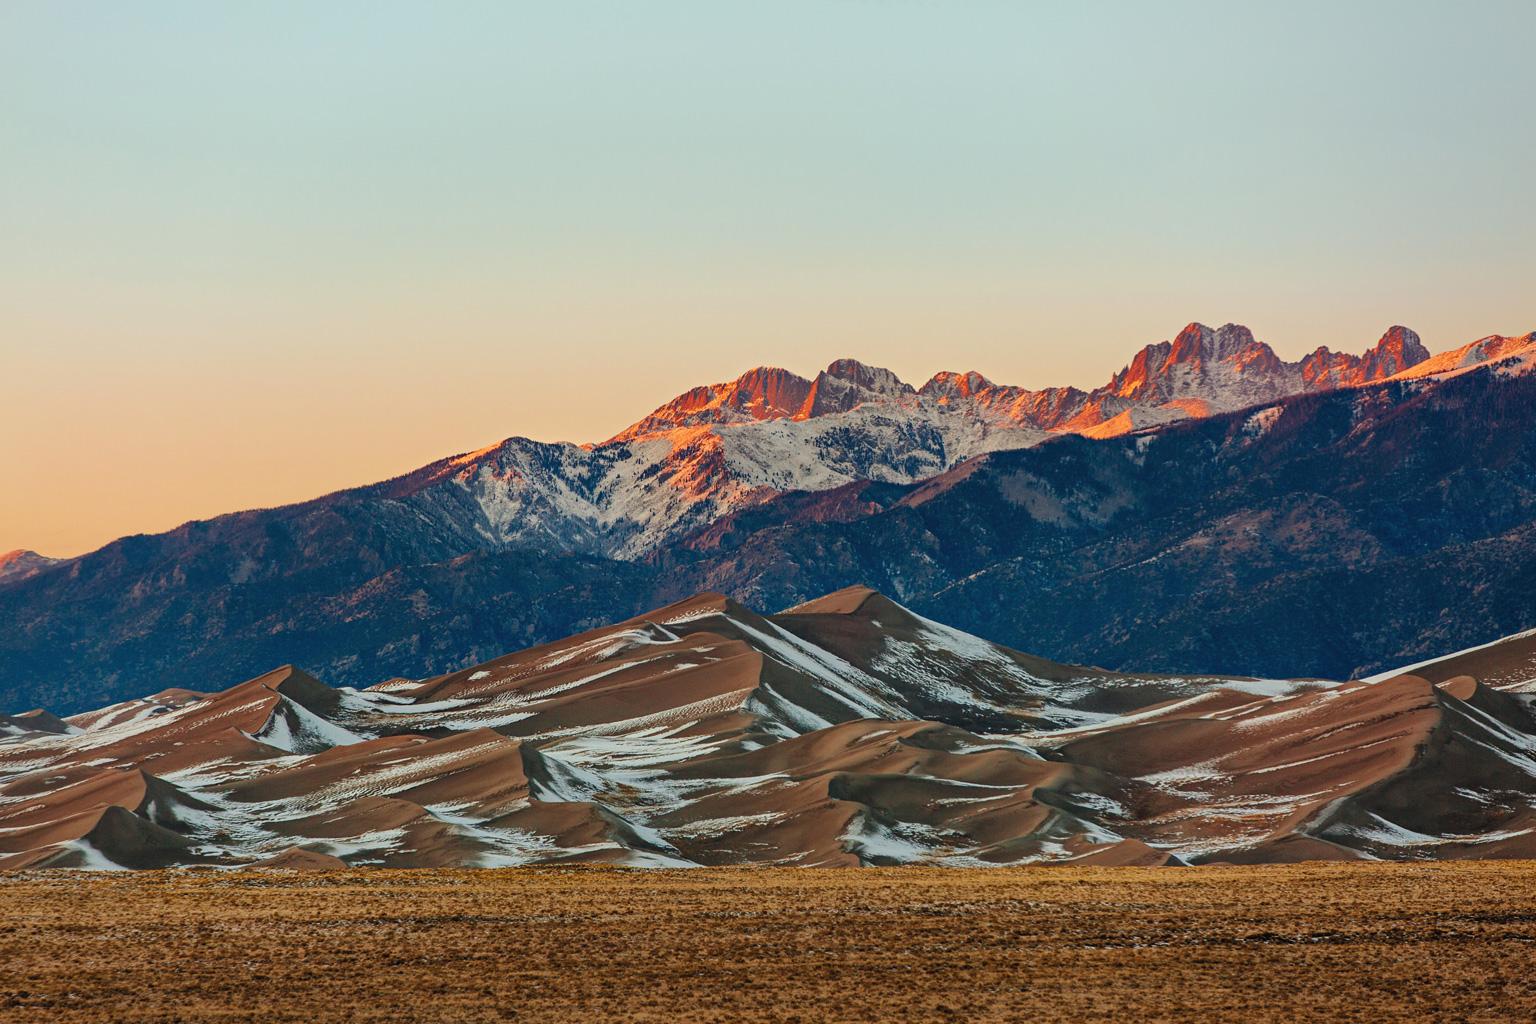 CindyGiovagnoli_Great_Sand_Dunes_Zion_National_Park_Horseshoe_Bend_Truck_Camping_Toyota_The_Narrows_roadtrip_Utah_Colorado-003.jpg